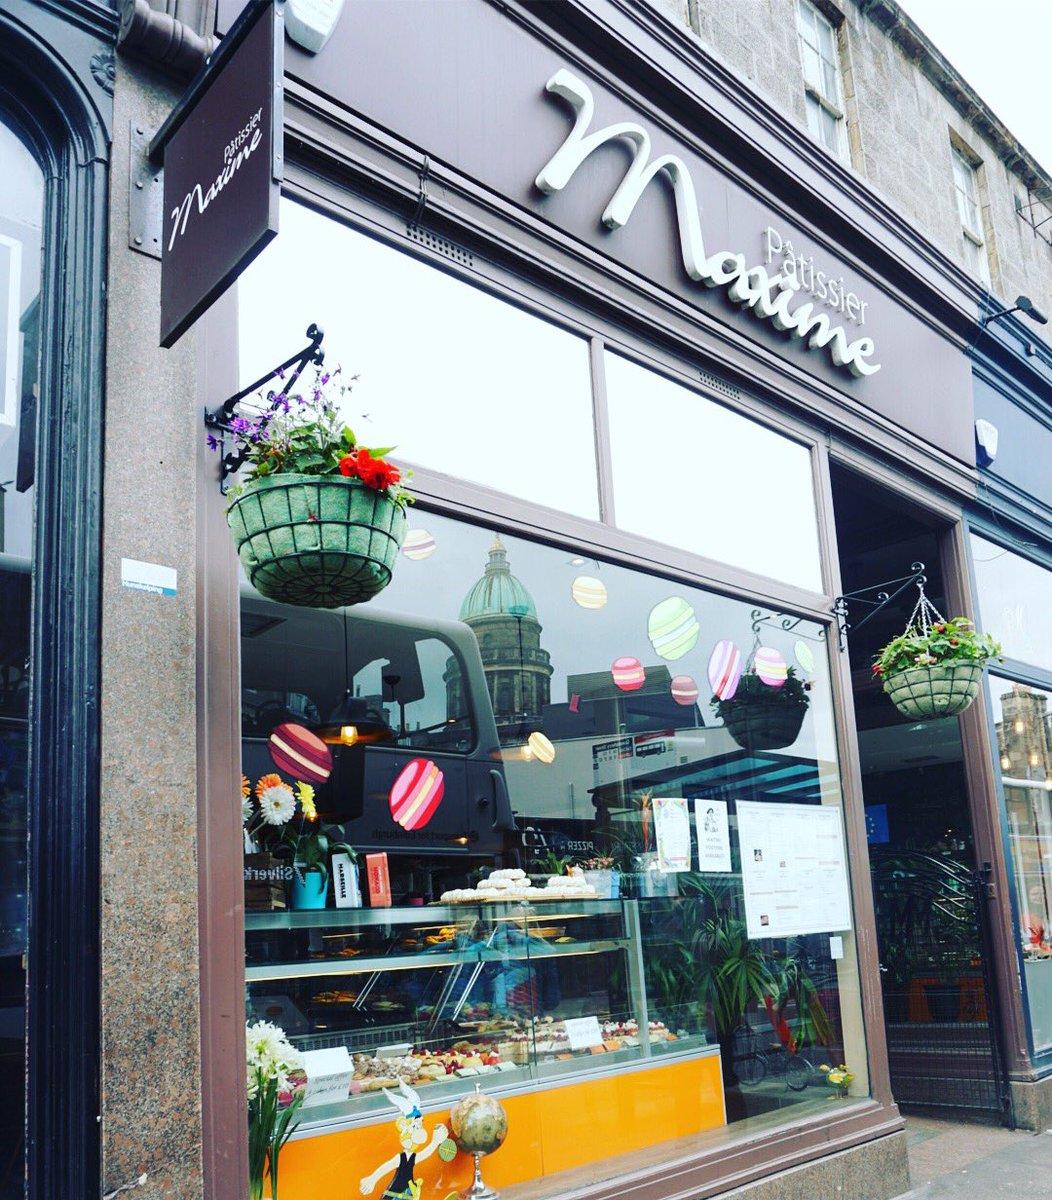 The hanging baskets outside Pàtissier Maxime reminding us it's still summer 🌼💐🍰🍭 #scottishweather #westend #takeacloserlook #hiddengems #edinburgh #edinburghlife #edinburghfood